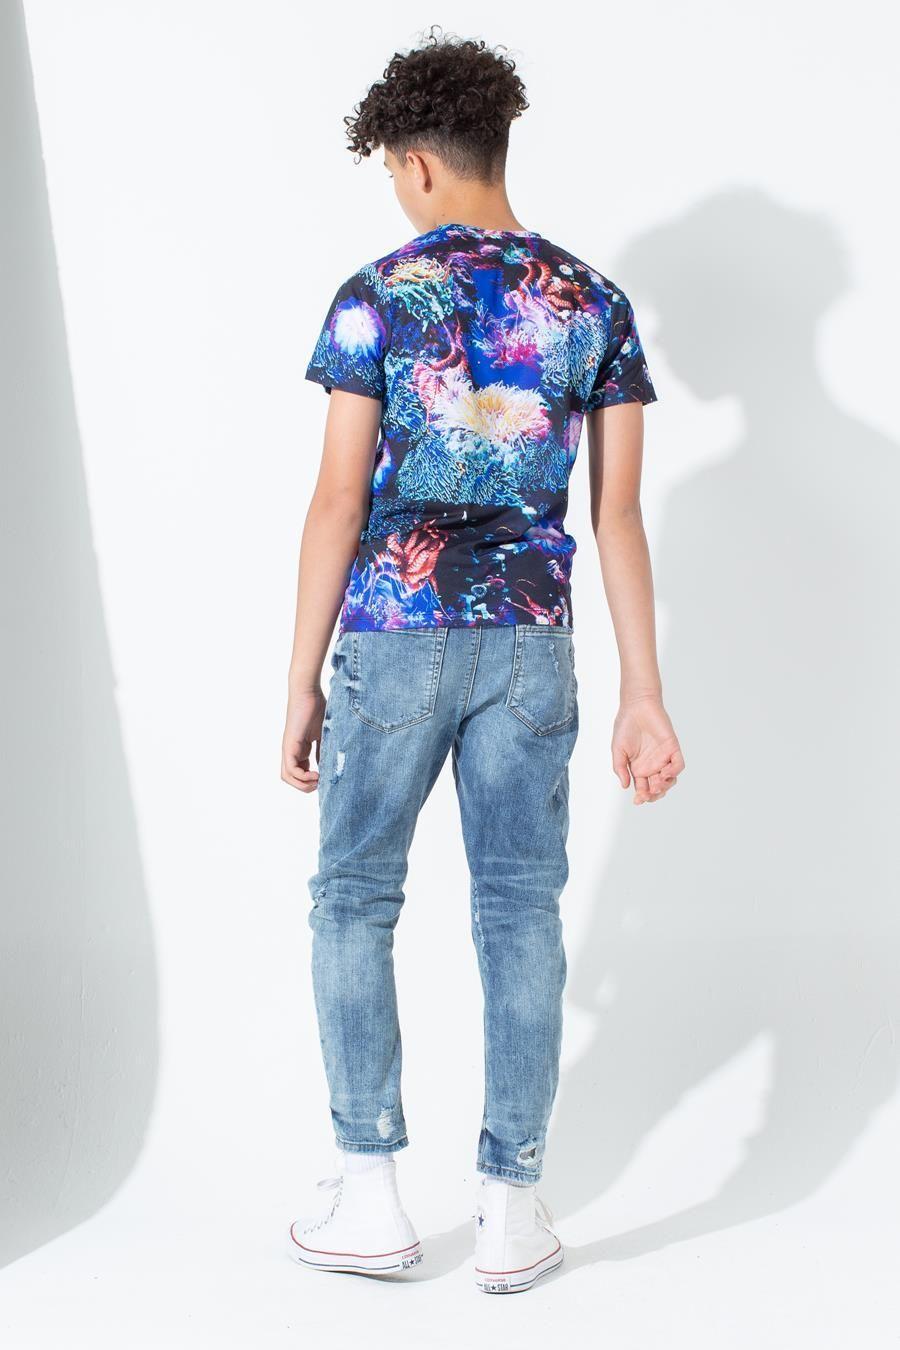 Hype Octo Palace Kids T-Shirt